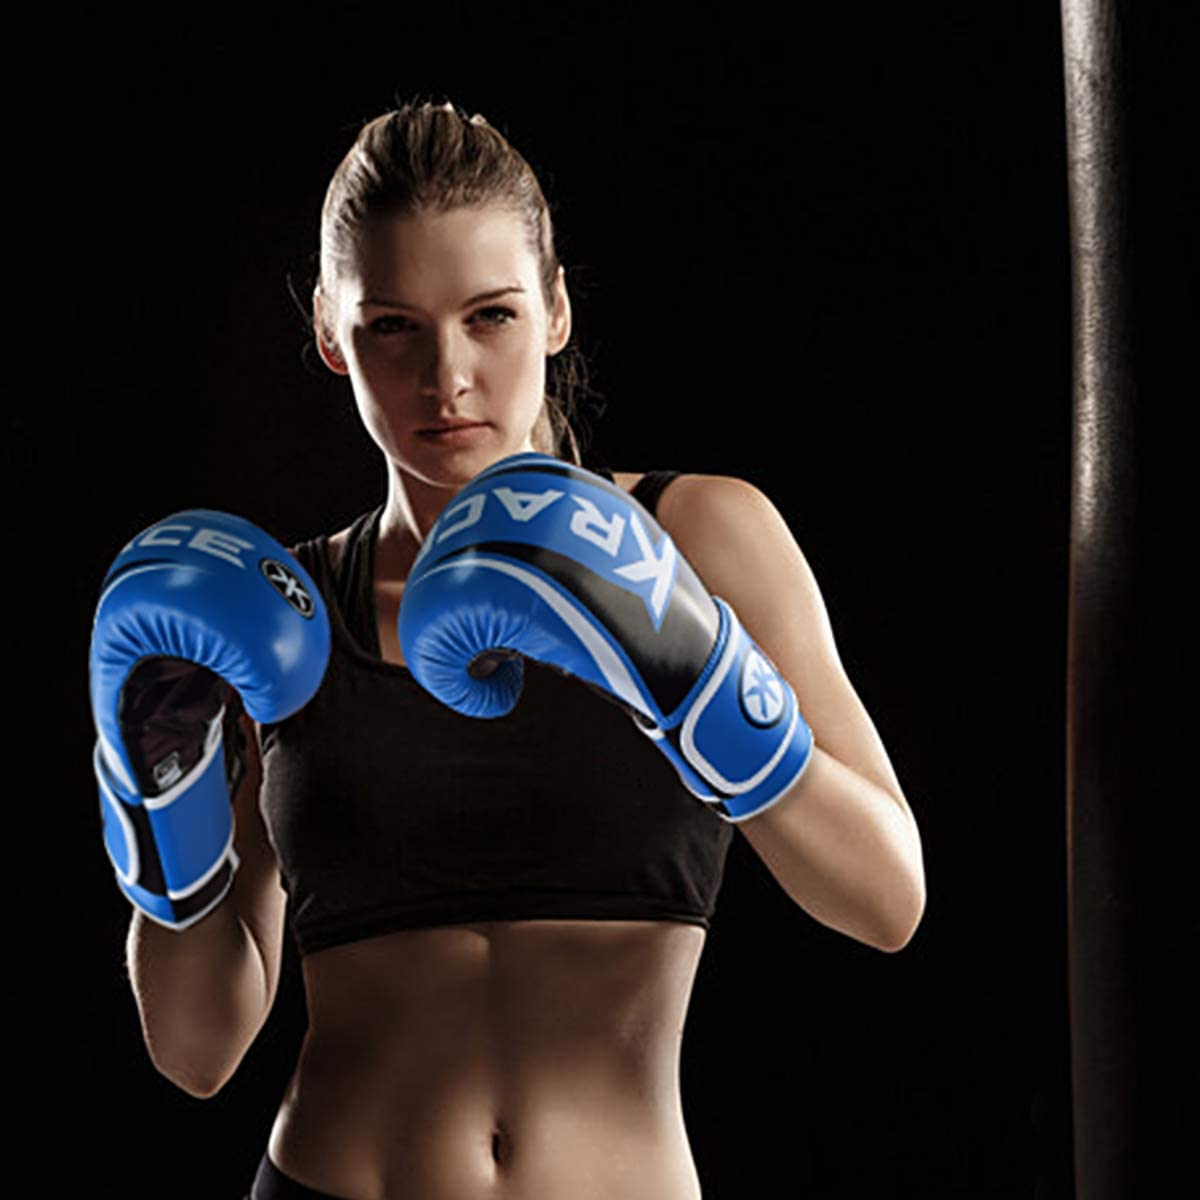 KRACE Boxing Gloves for Kids Men Women 6oz 8oz 10oz 12oz 14oz 16oz Boxing Punching Gloves Training Gloves Sparring Bag Gloves